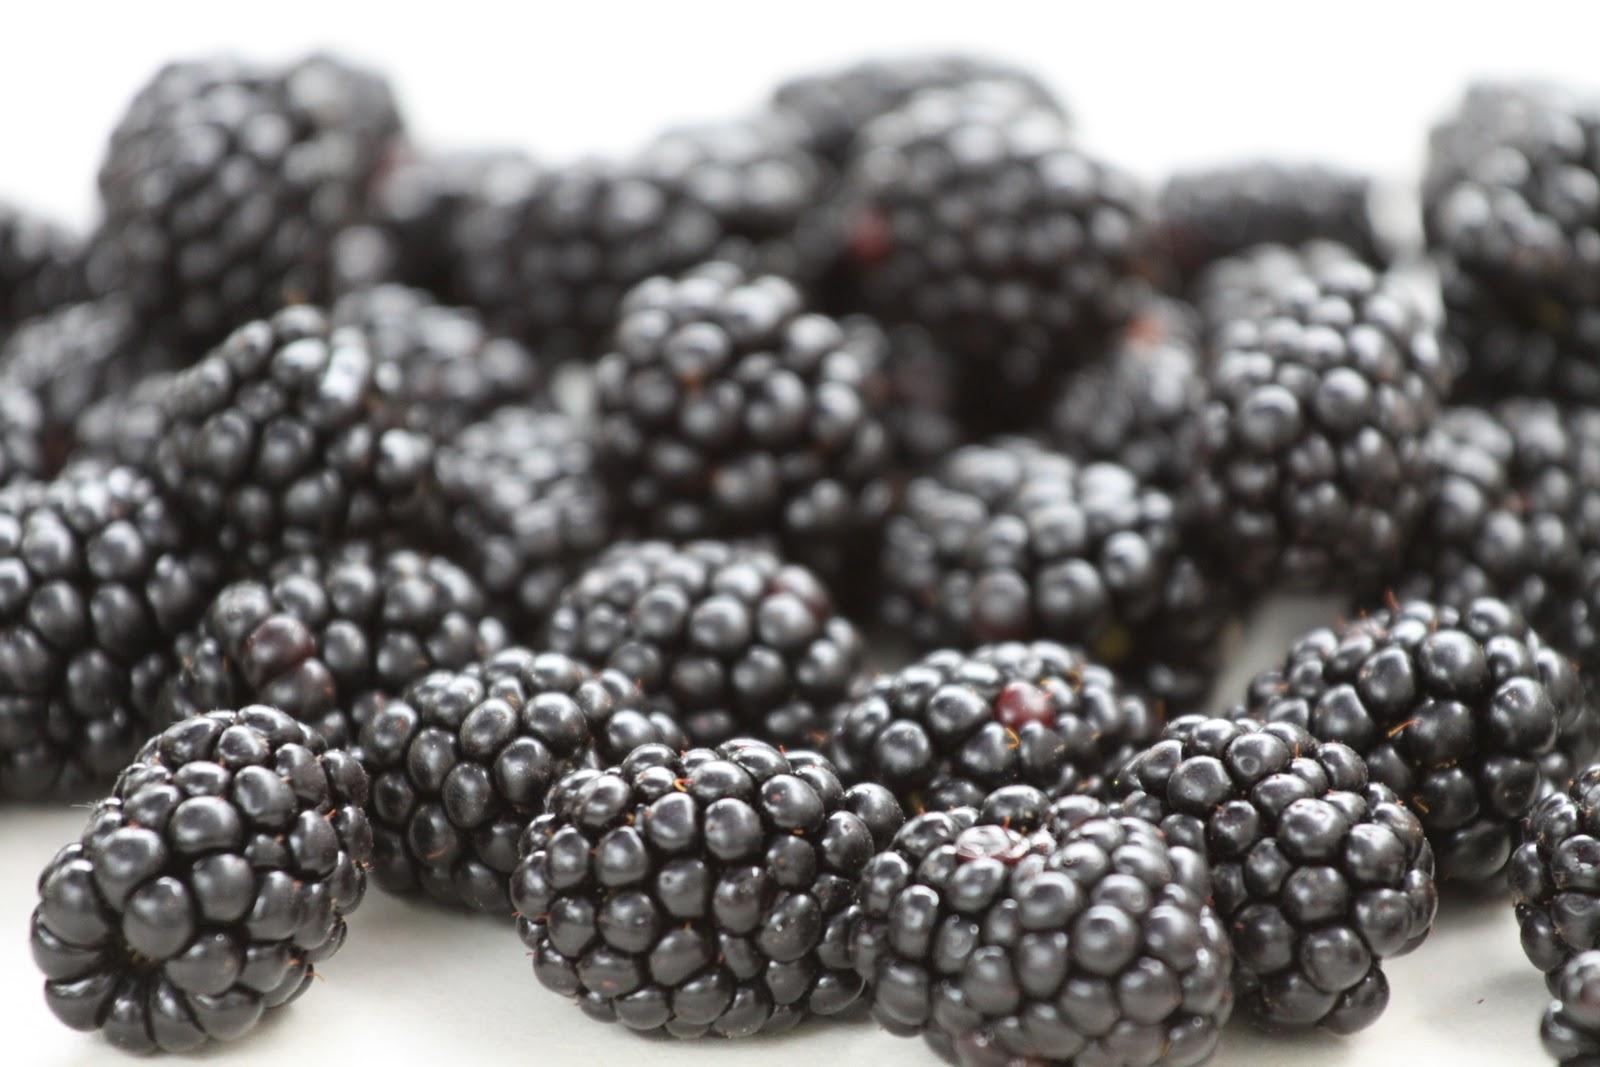 Blackberry Scrub